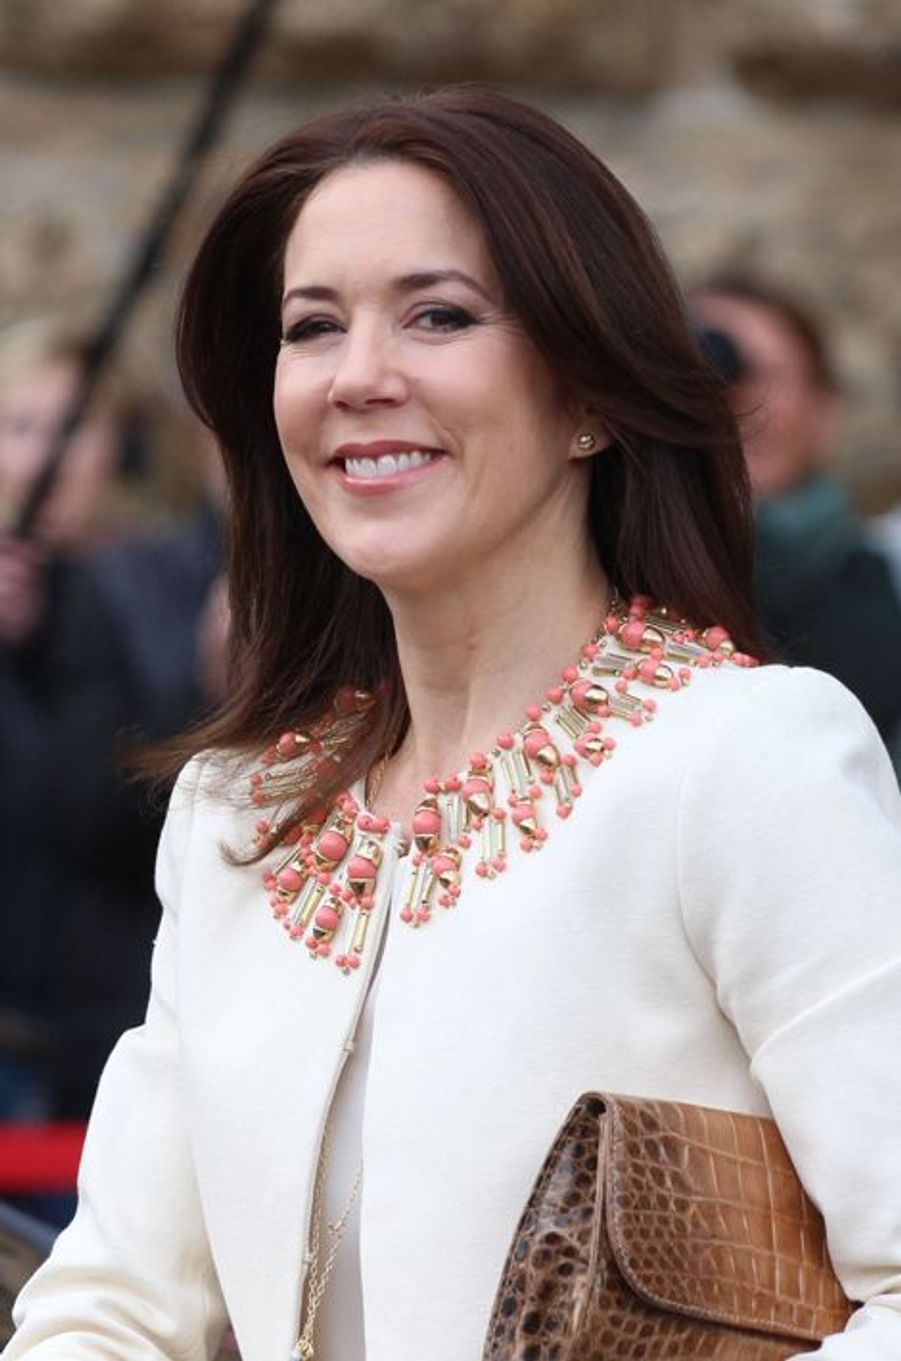 La princesse Mary de Danemark à Hambourg, le 19 mai 2015